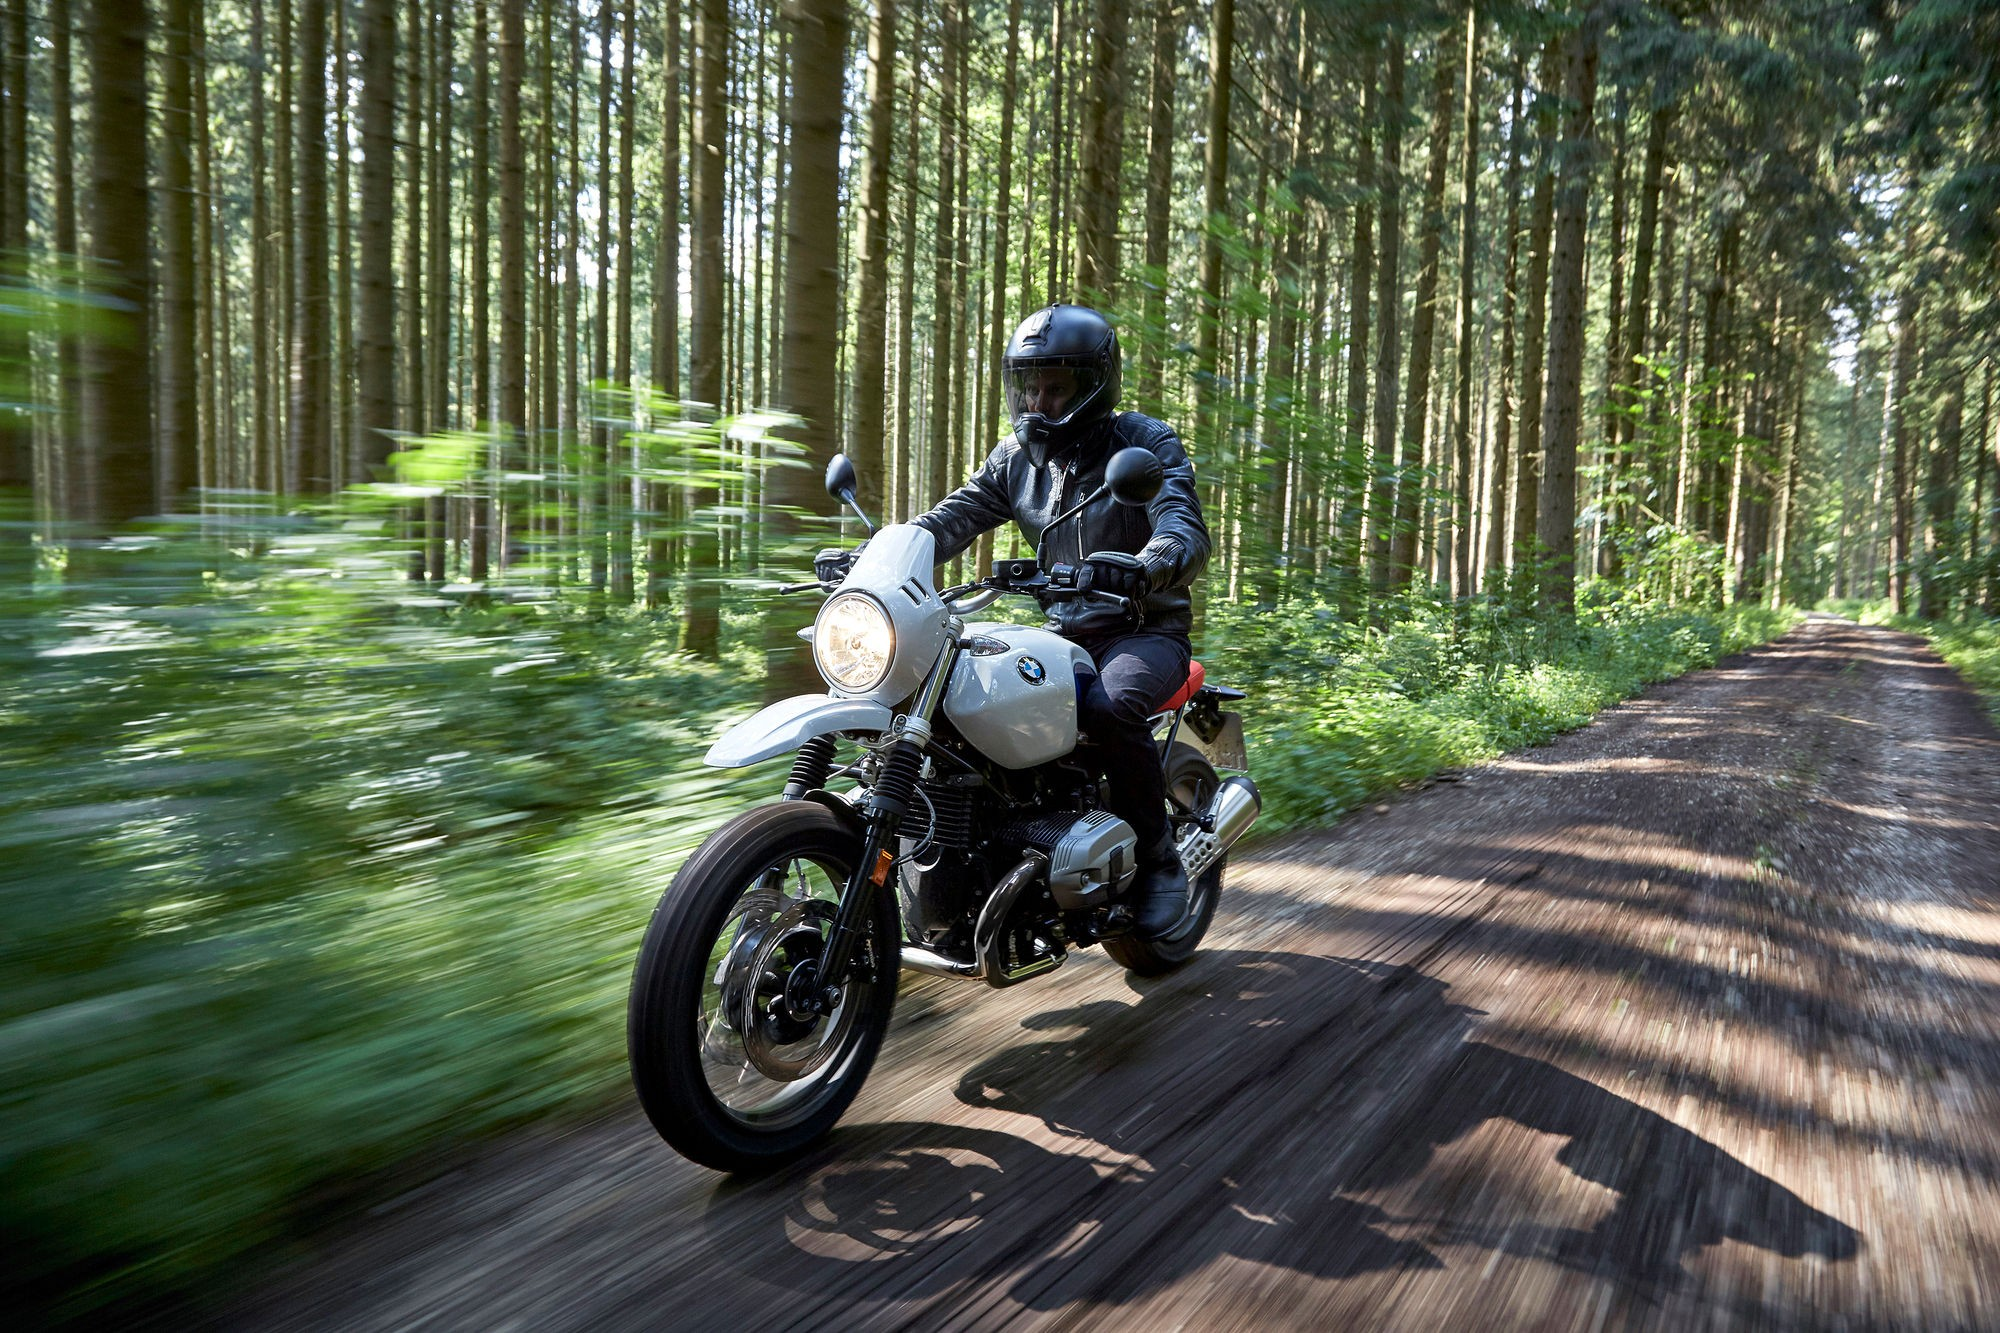 Bmw 1200 Gs Adventure 2018 >> BMW R NINE T URBAN GS specs - 2017, 2018 - autoevolution